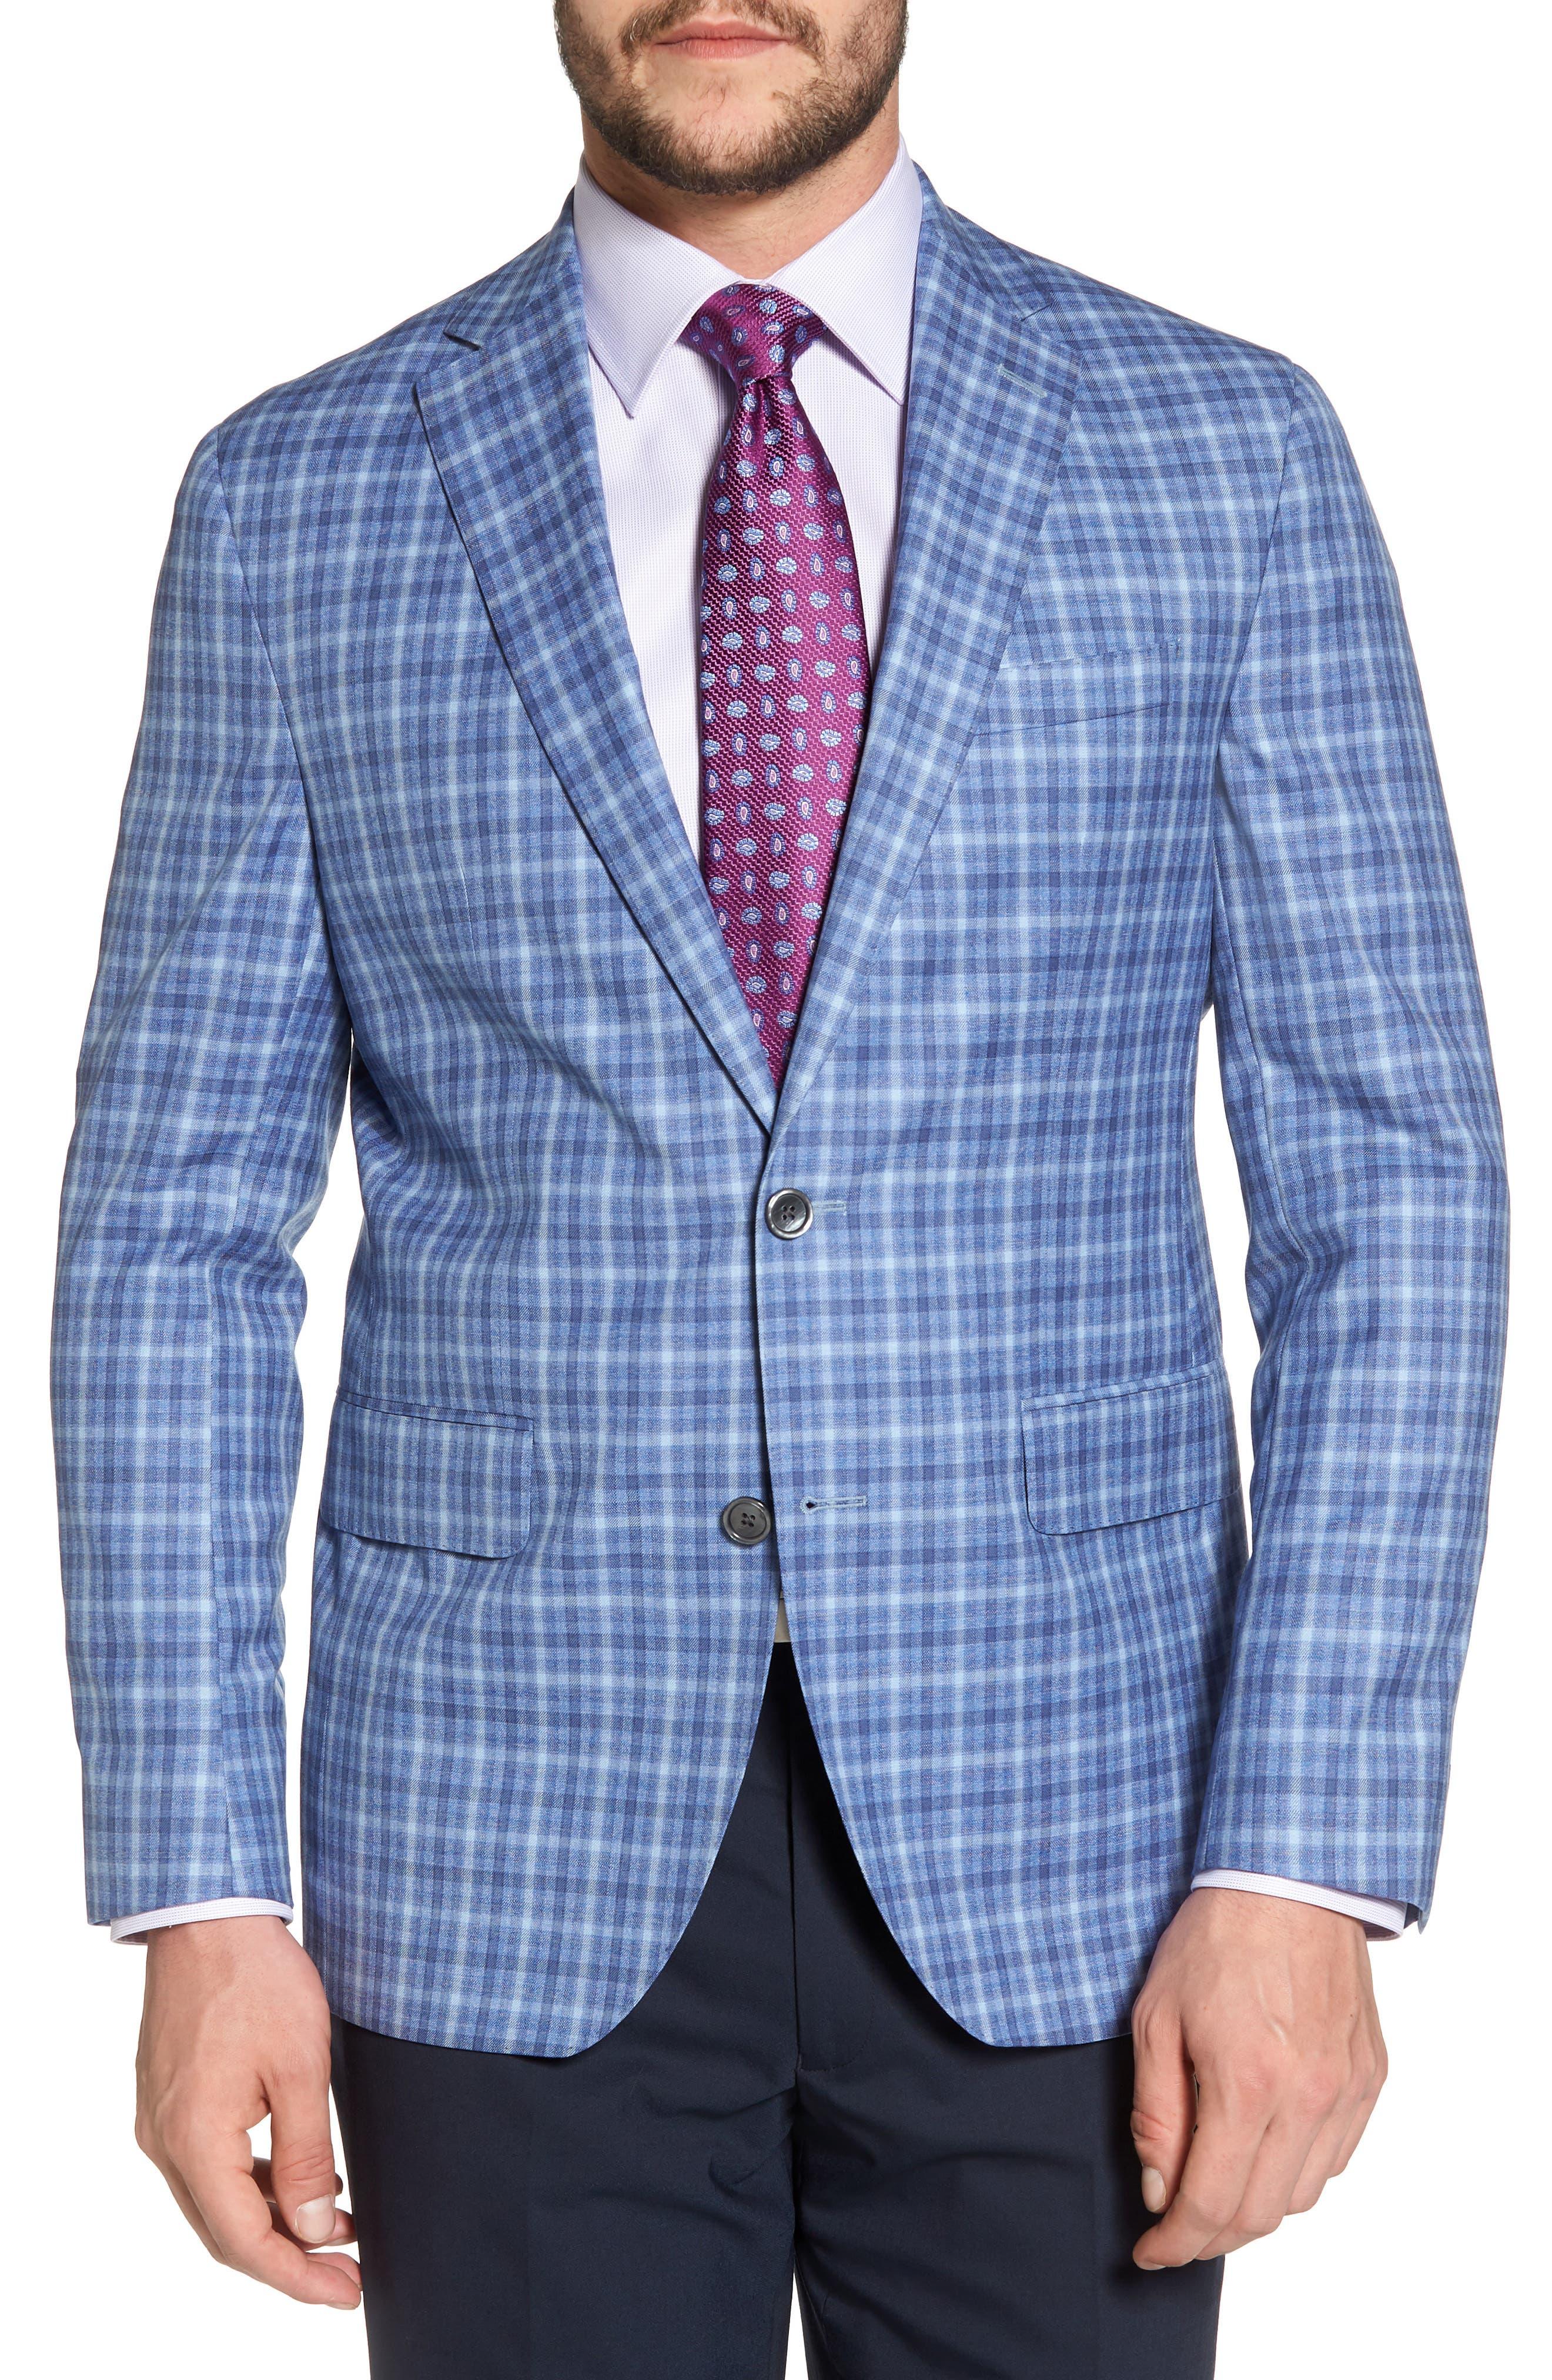 Arnold Classic Fit Plaid Wool Sport Coat,                             Main thumbnail 1, color,                             Blue